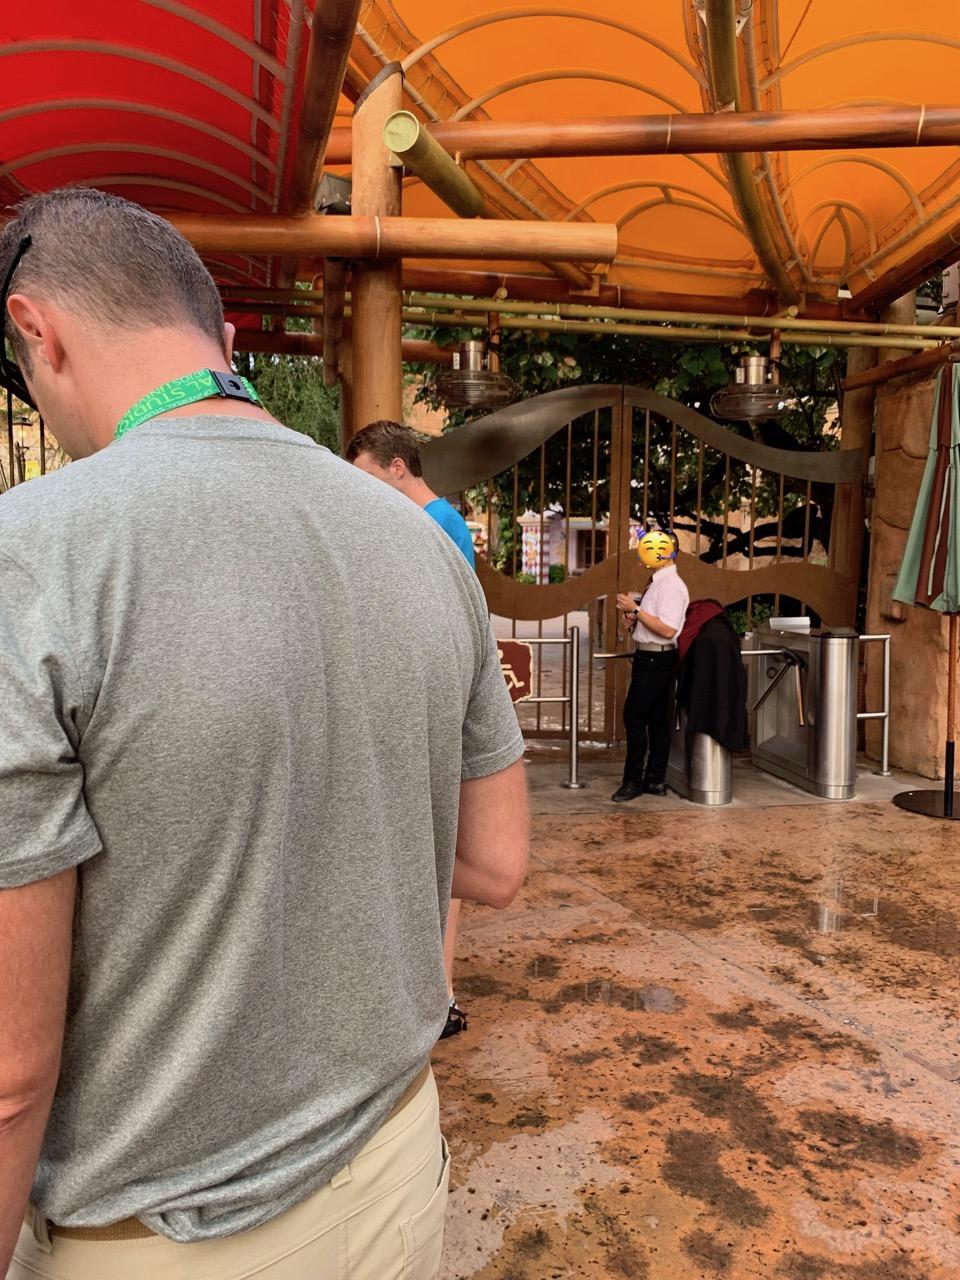 universal orlando summer 2019 trip report part 4 turnstiles 2.jpeg